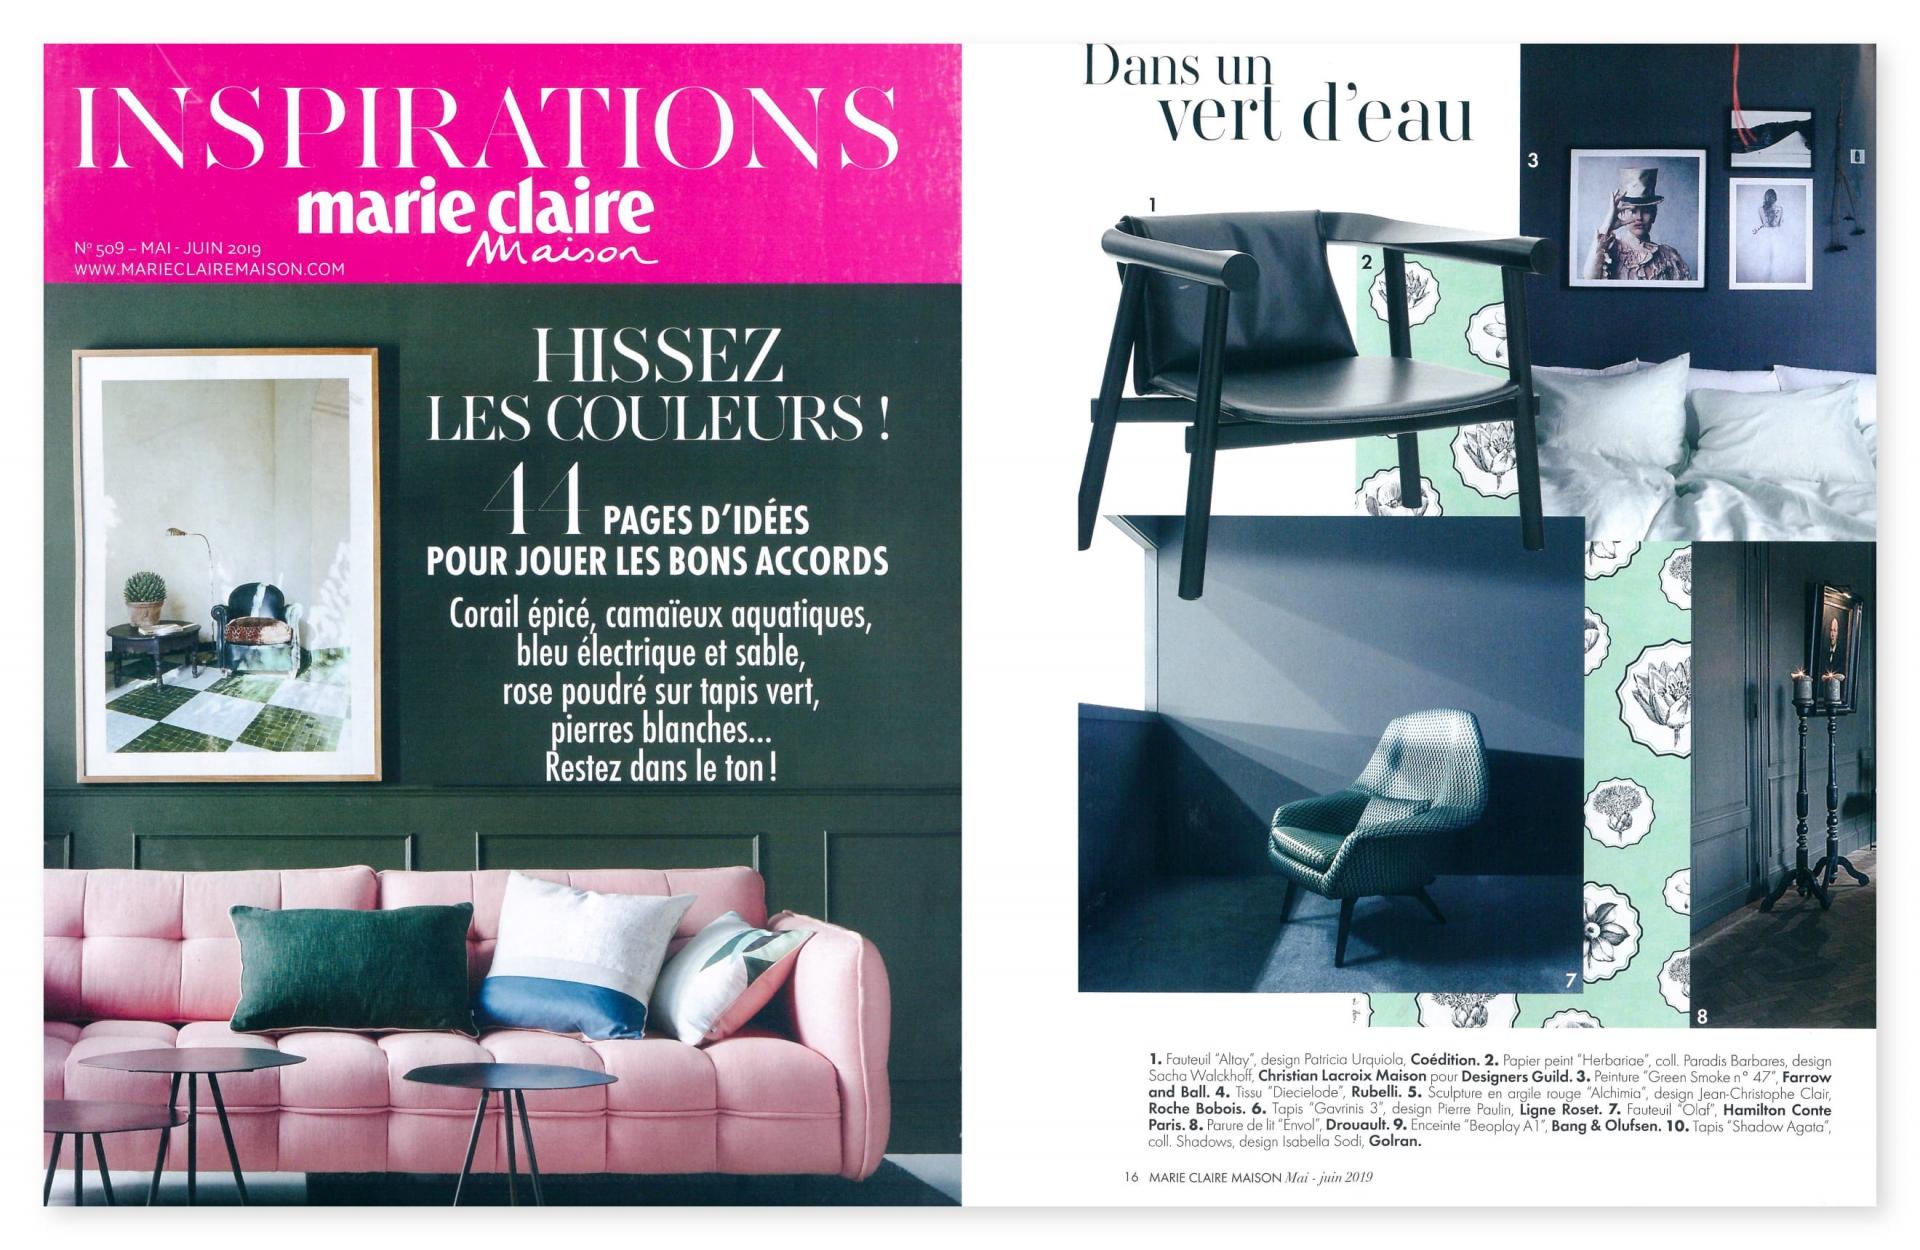 big en 995 hc press 2019 05 inspirations marieclairemaison fr